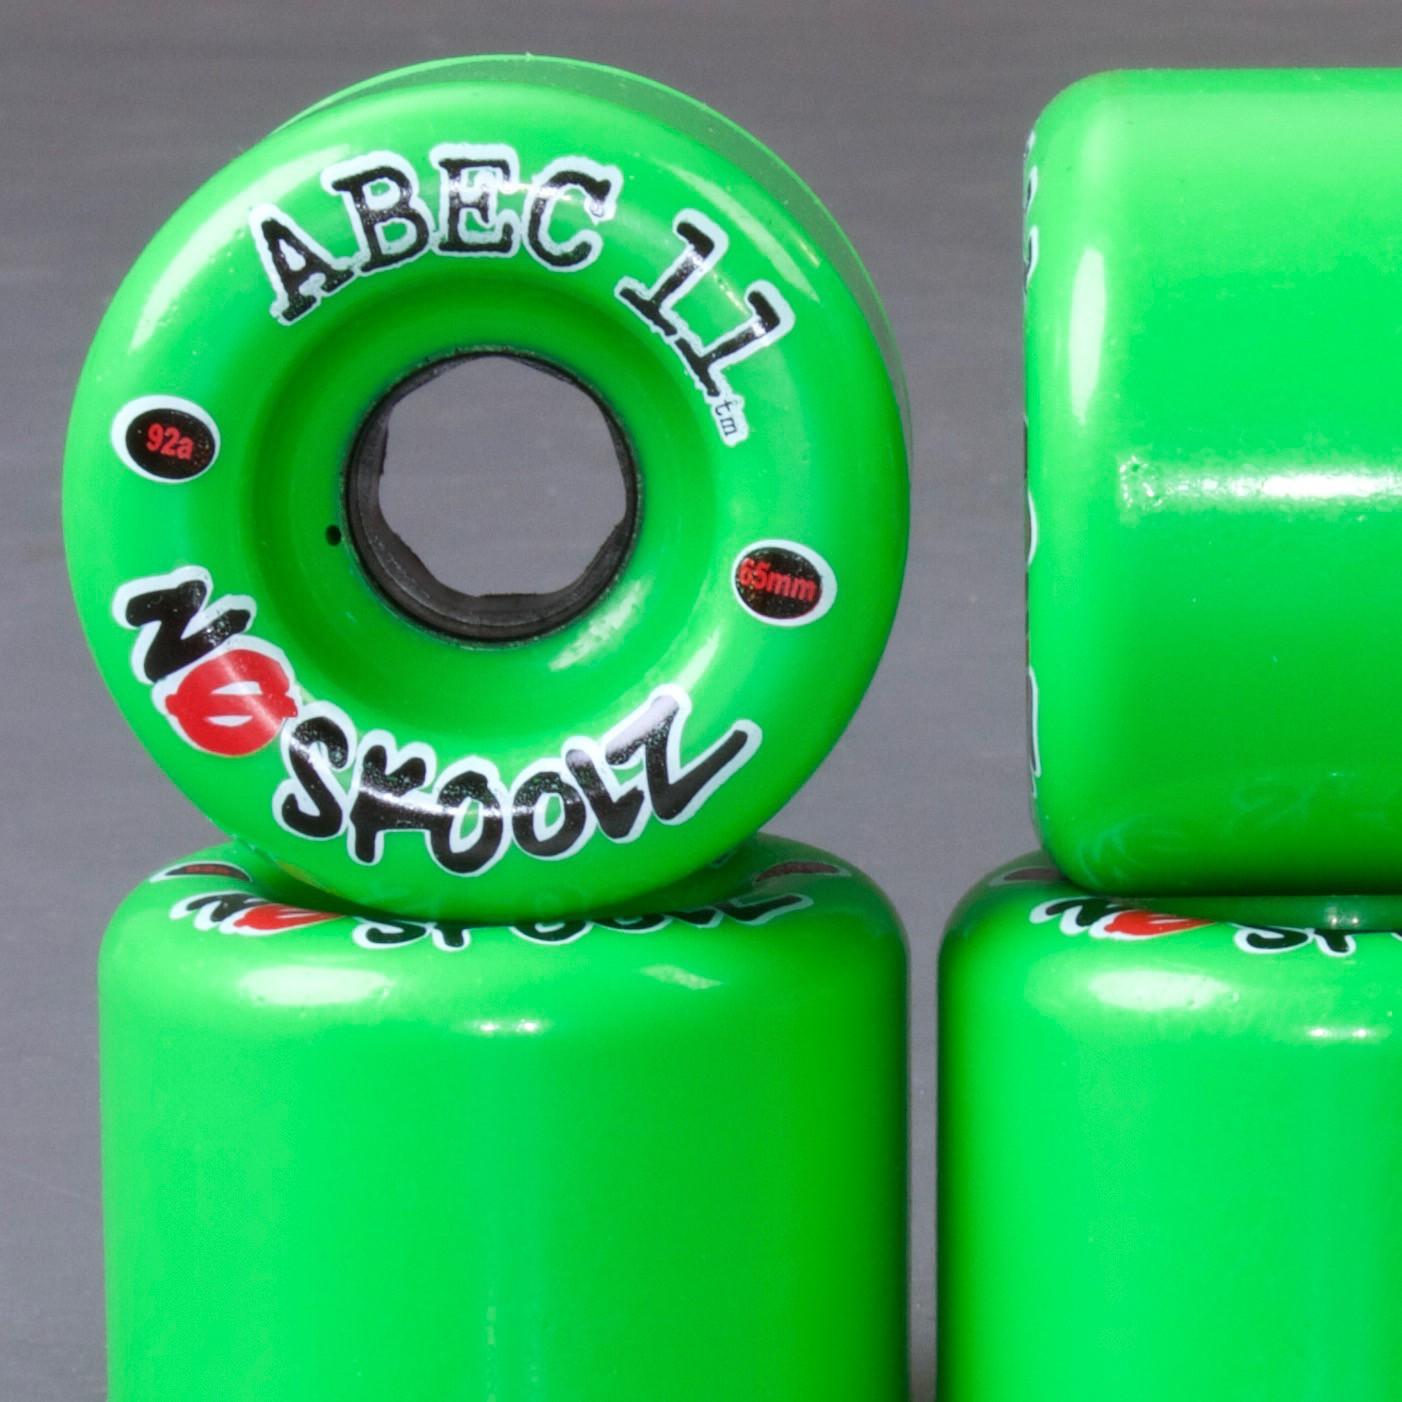 Abec 11 No Skoolz 65mm 92a